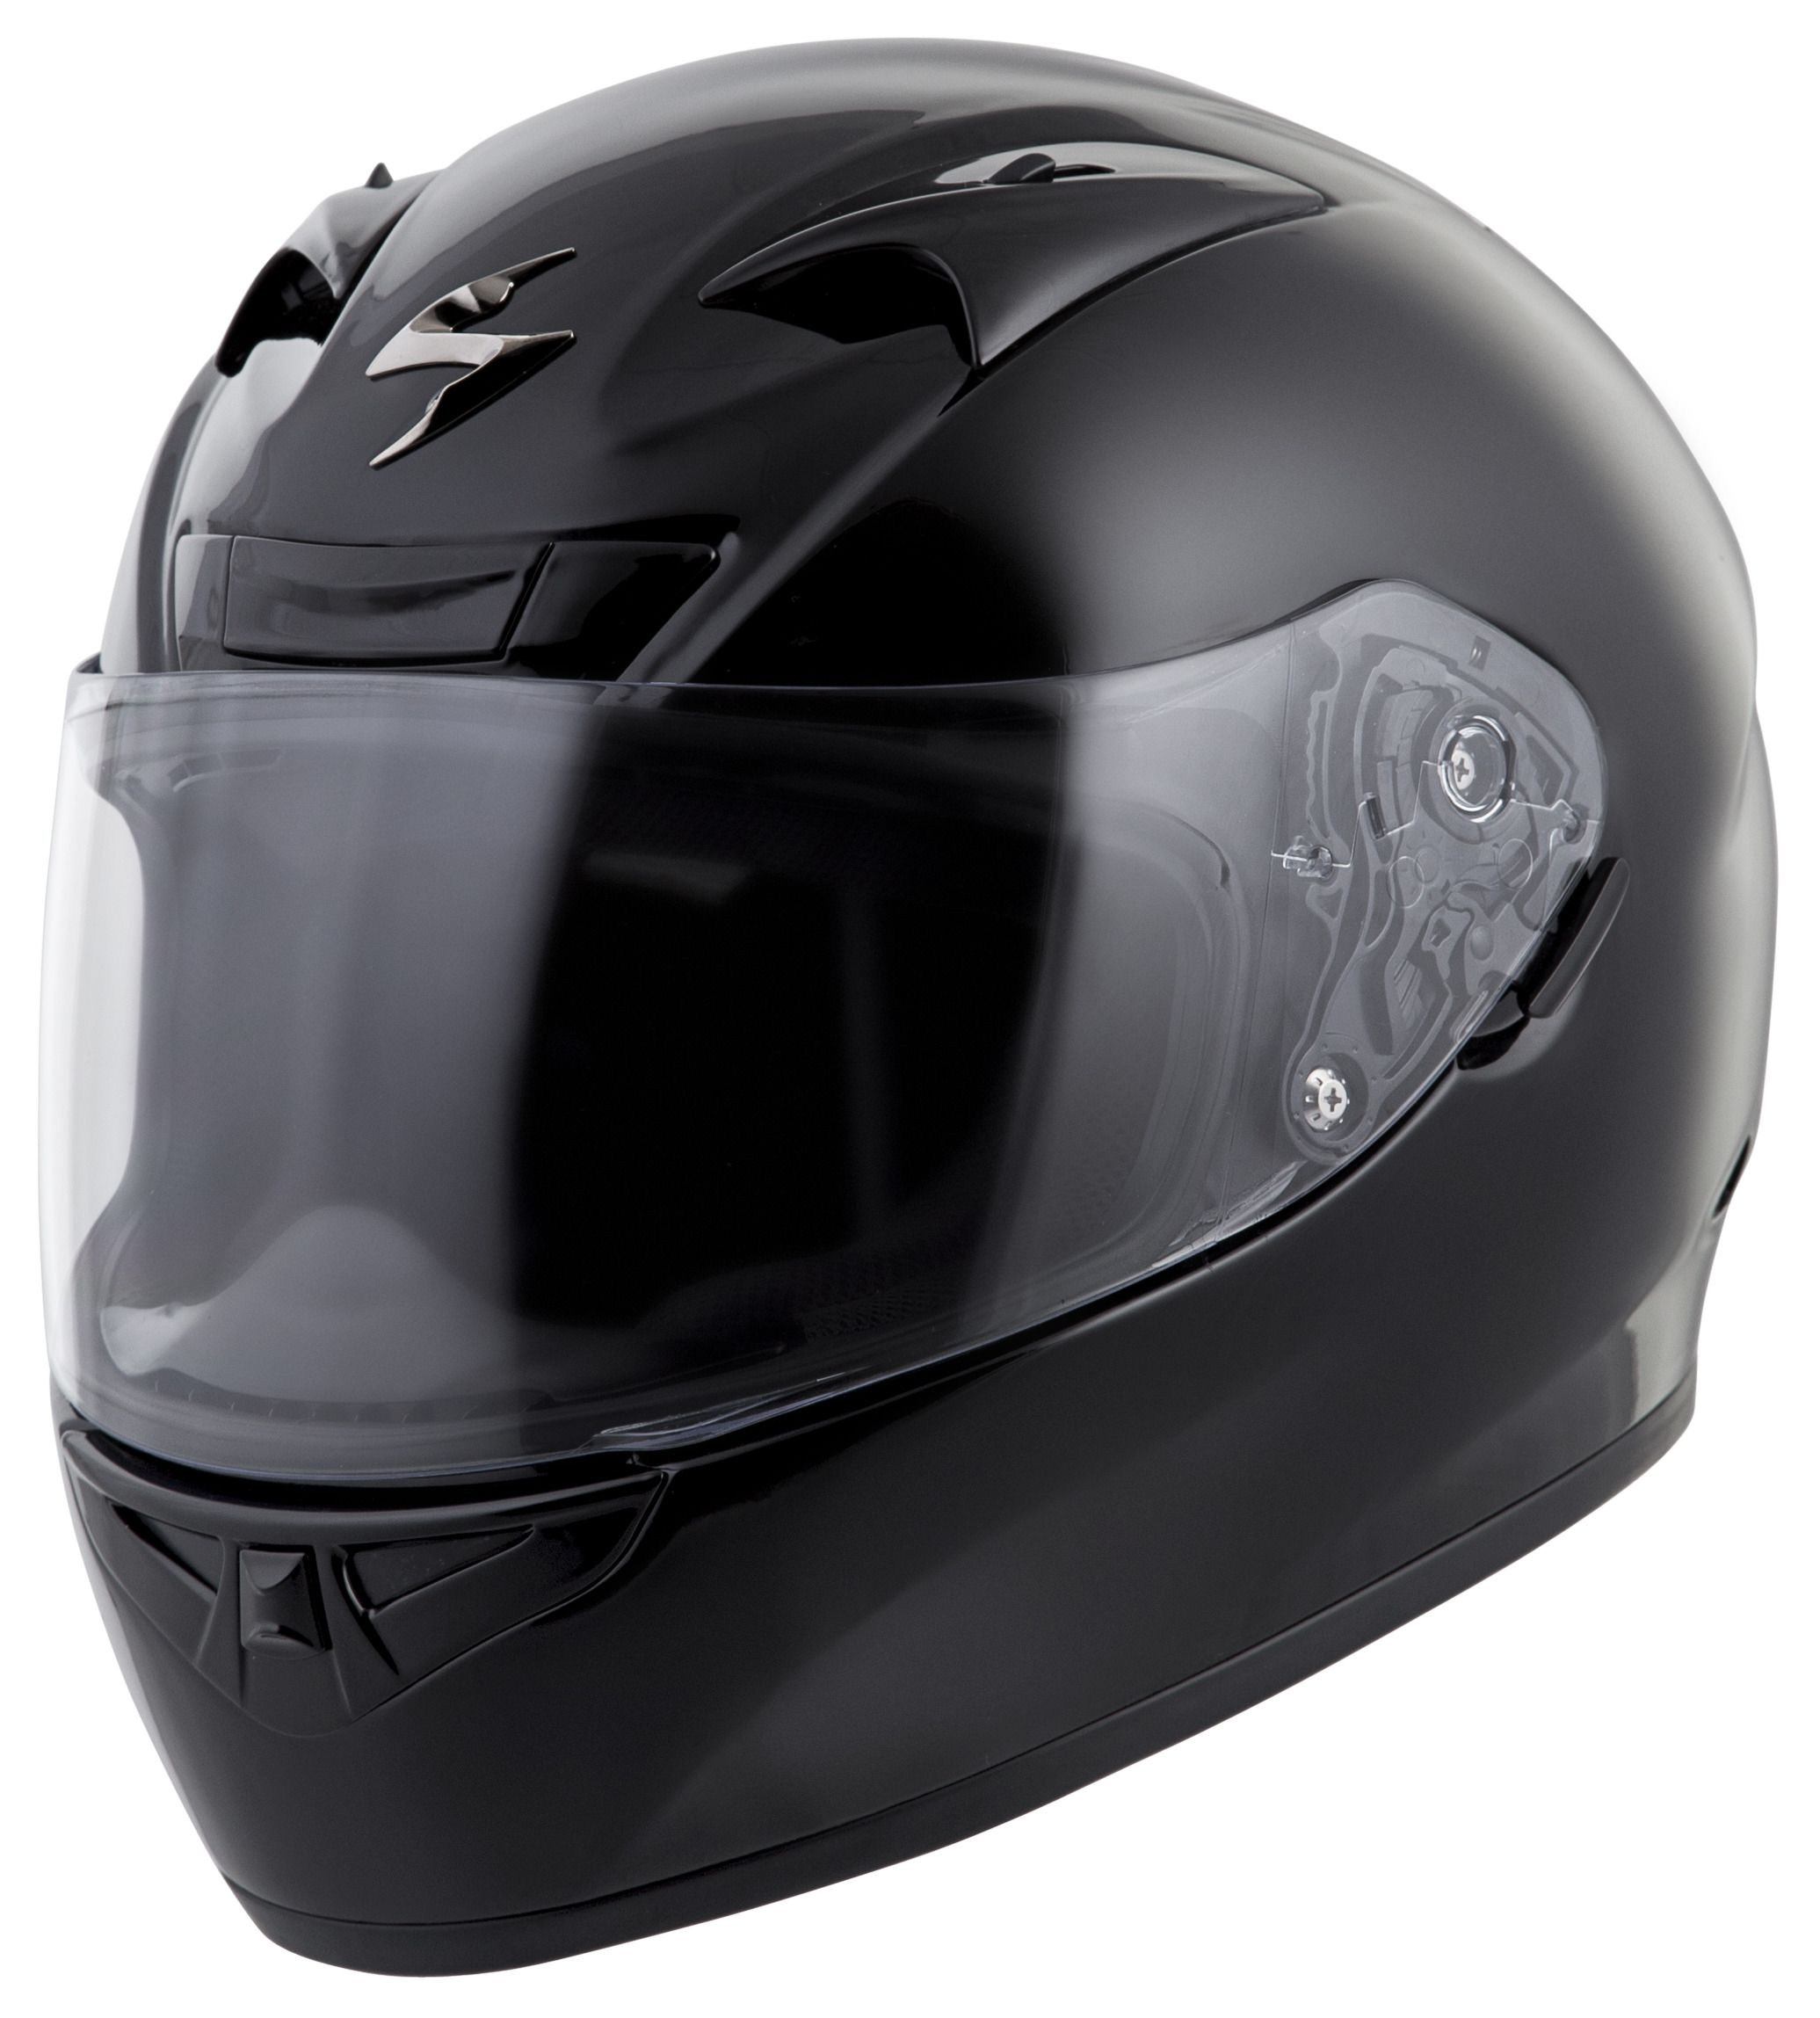 scorpion exo r710 helmet solid revzilla. Black Bedroom Furniture Sets. Home Design Ideas